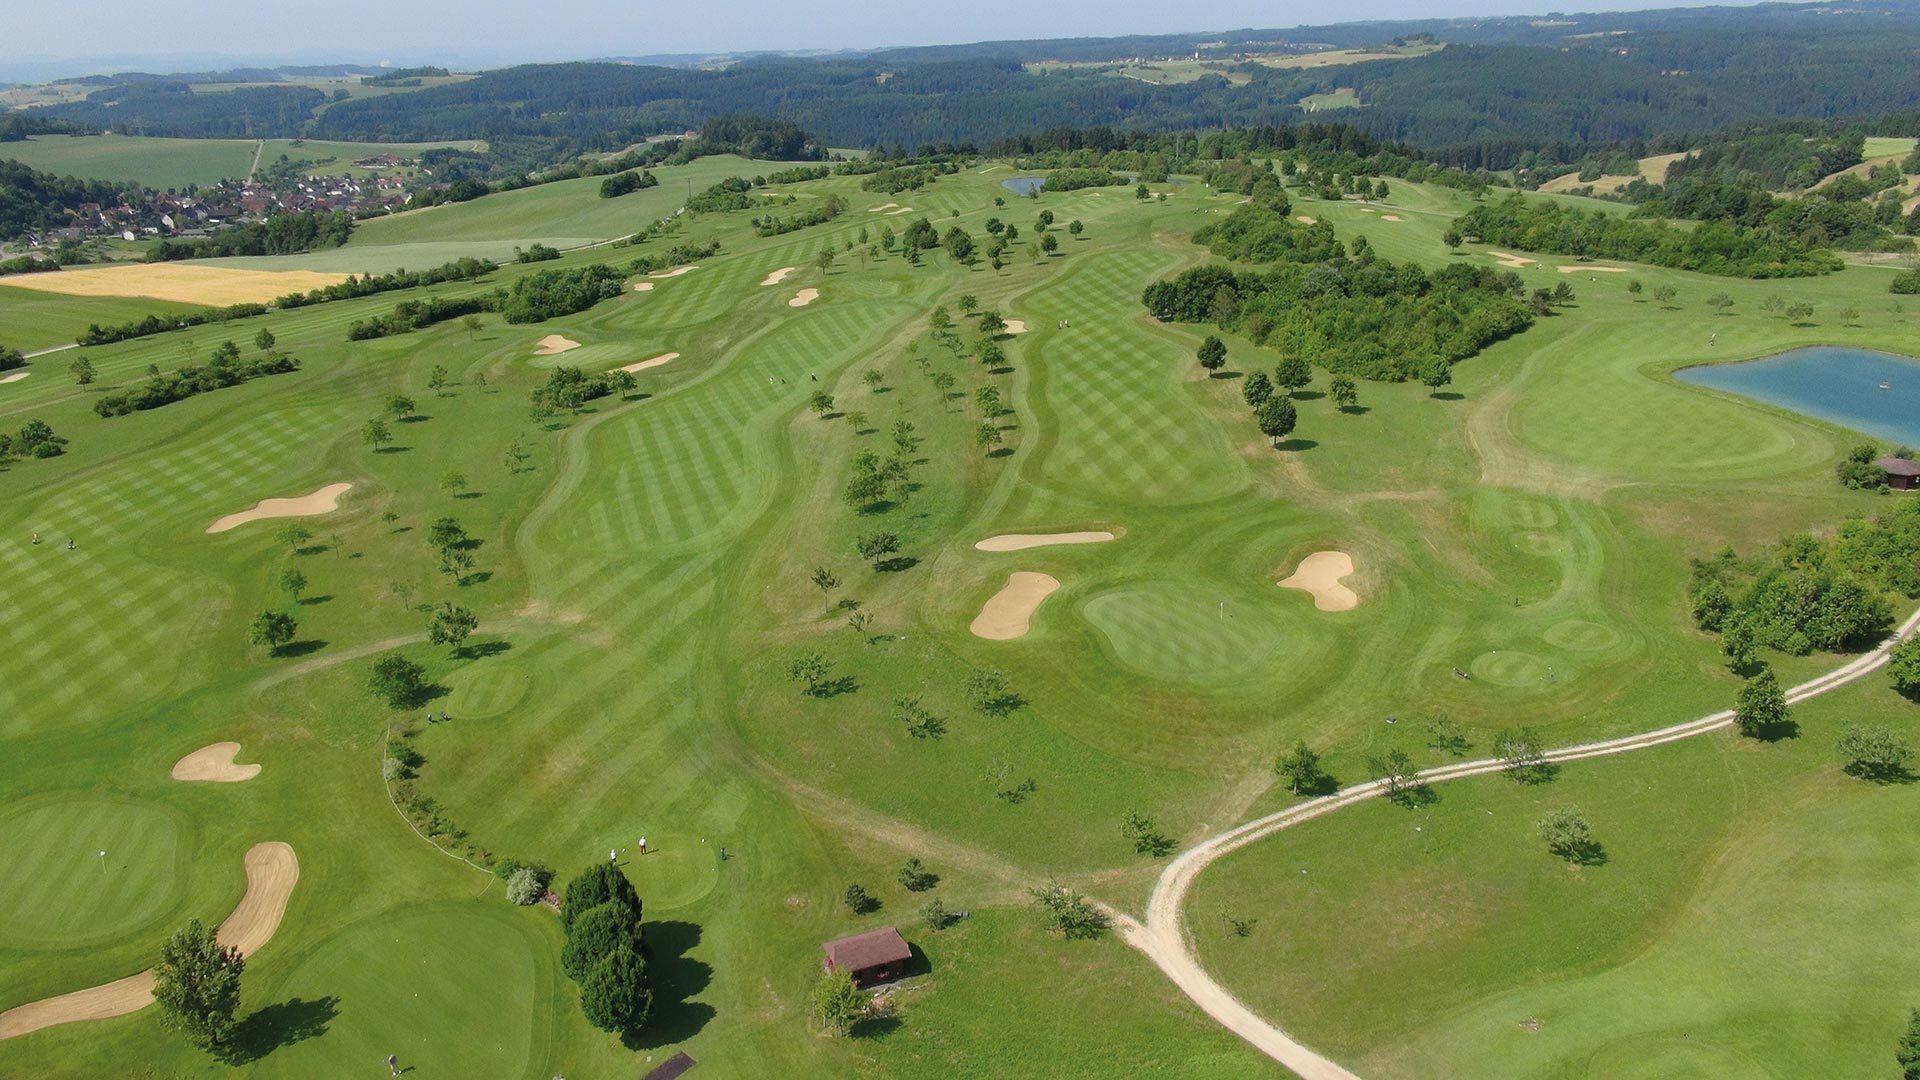 Geng's Linde - Golf Club Obere Alp